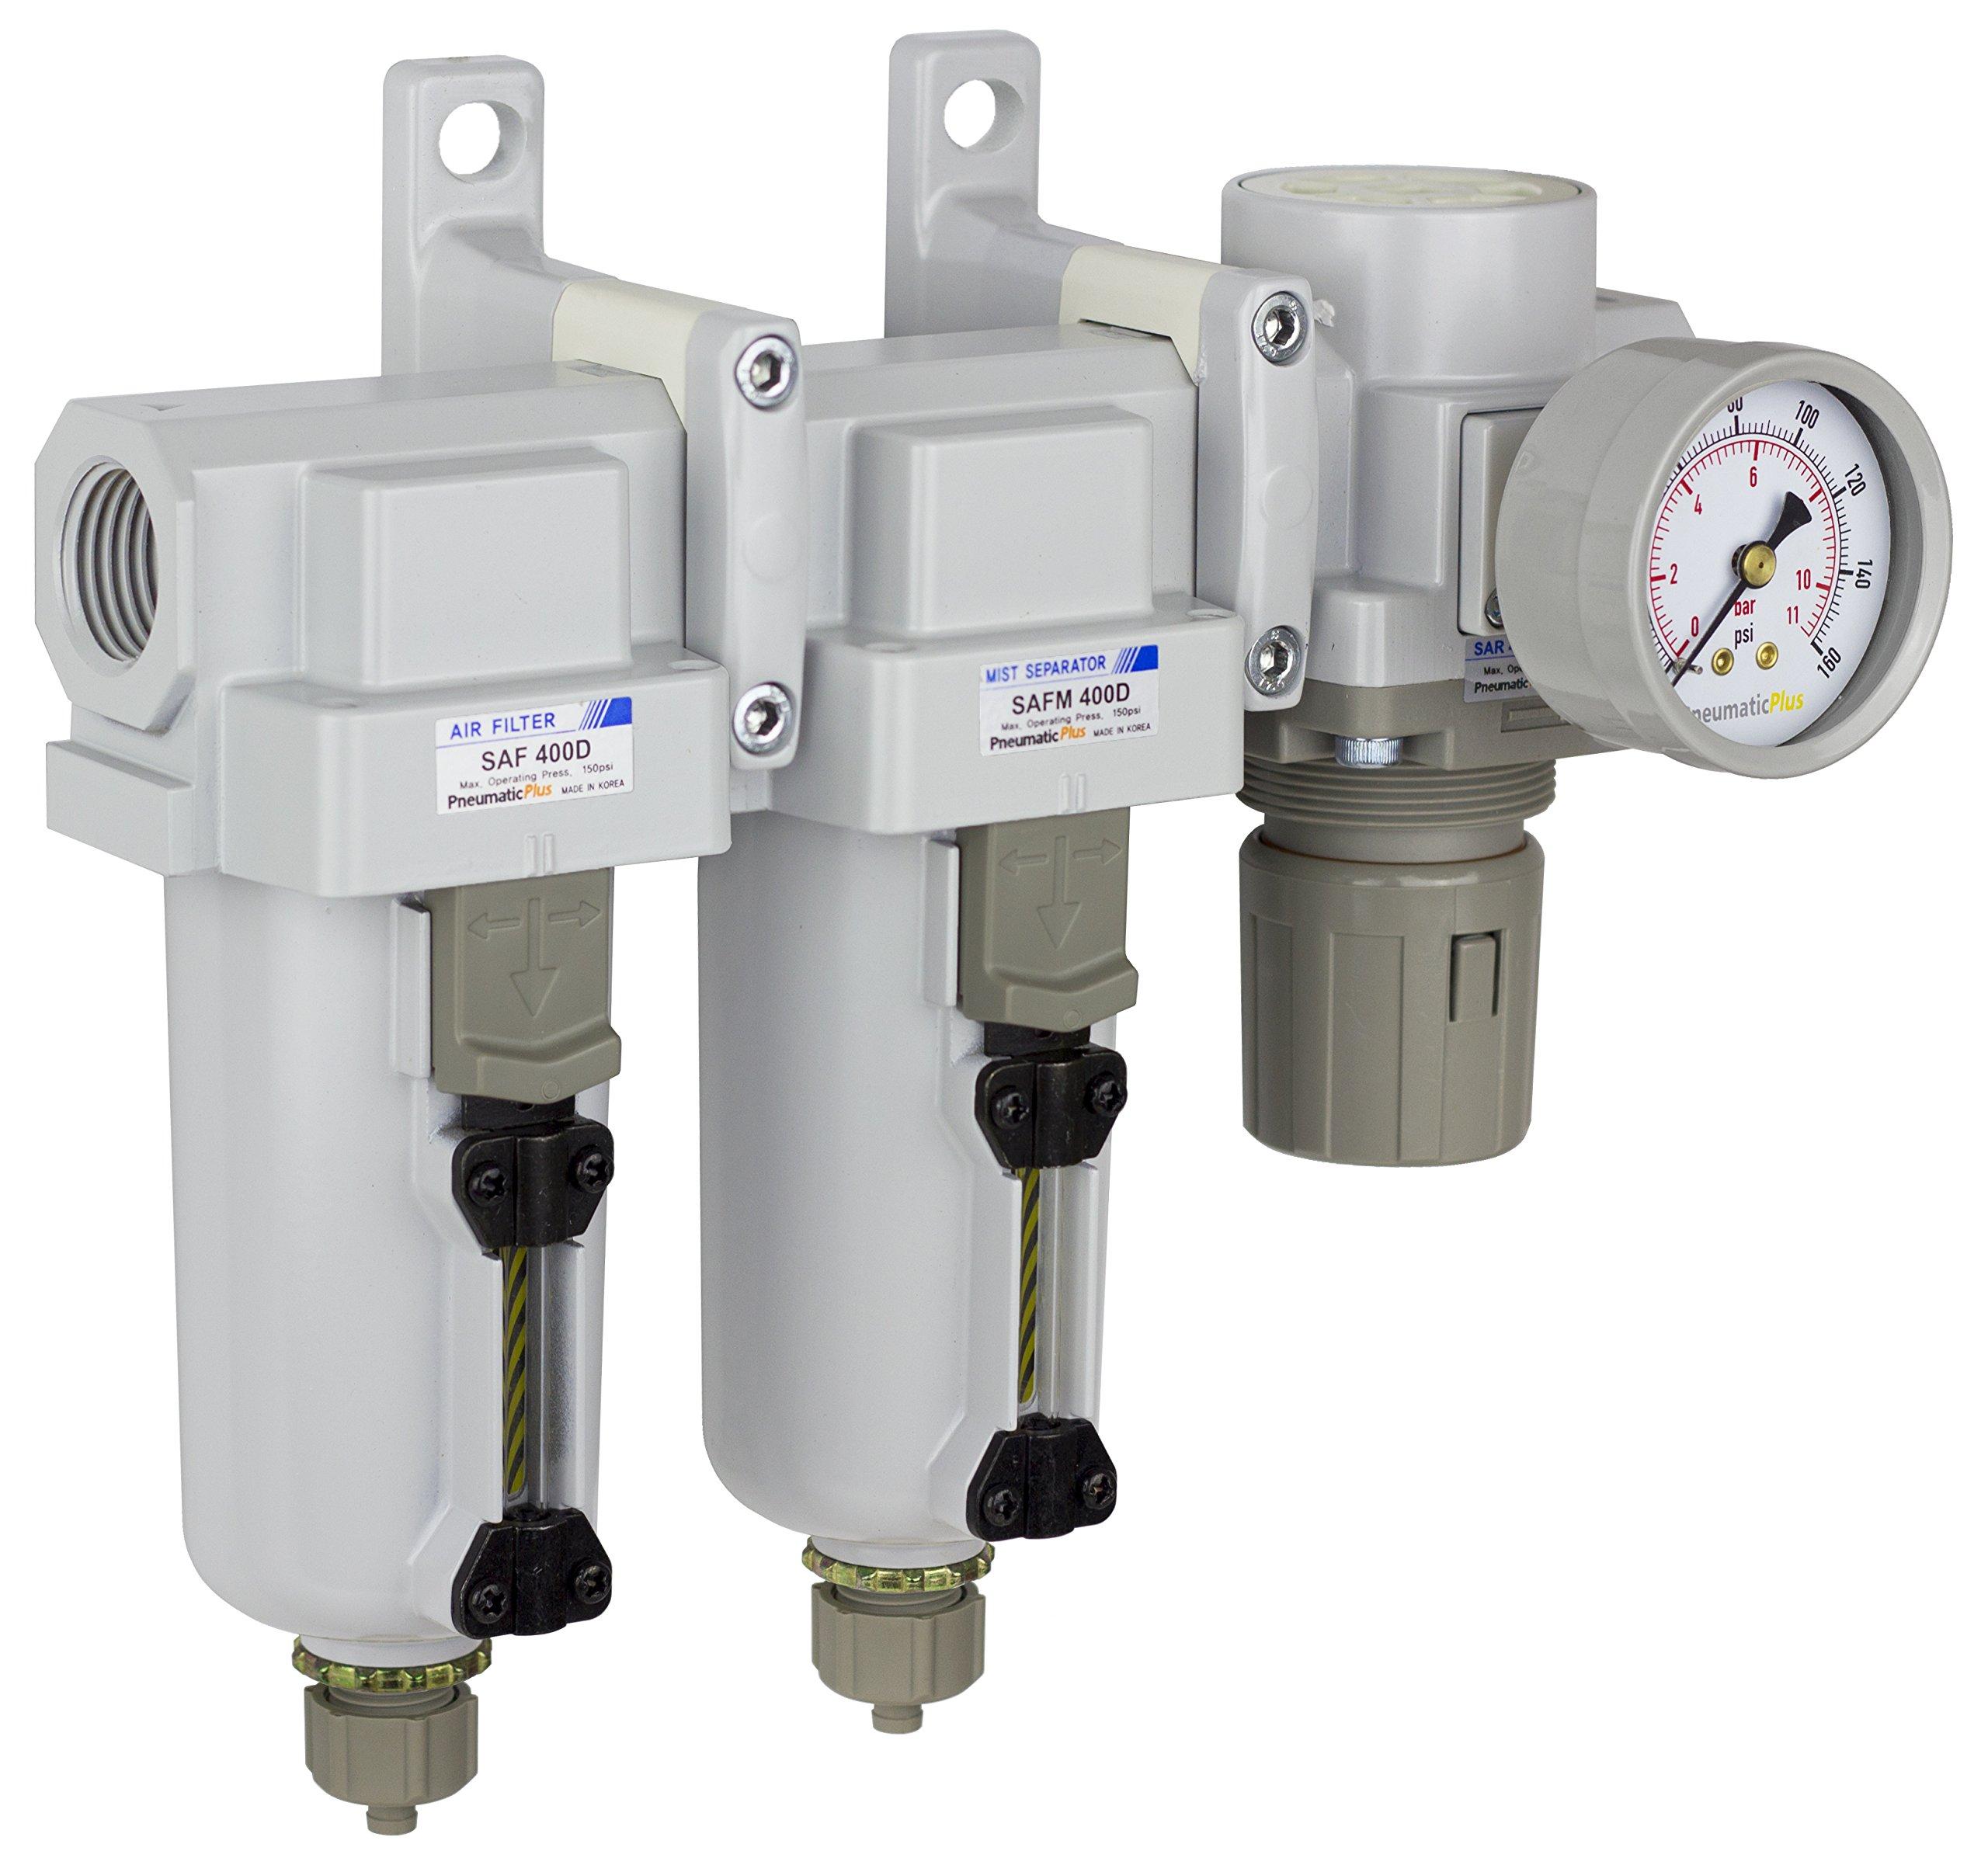 PneumaticPlus SAU430-N06G-MEP Three Stage Air Drying System Particulate Air Filter, Coalescing Filter, Air Pressure Regulator Combo 3/4'' NPT - Metal Bowl, Manual Drain, Bracket, Gauge by PneumaticPlus